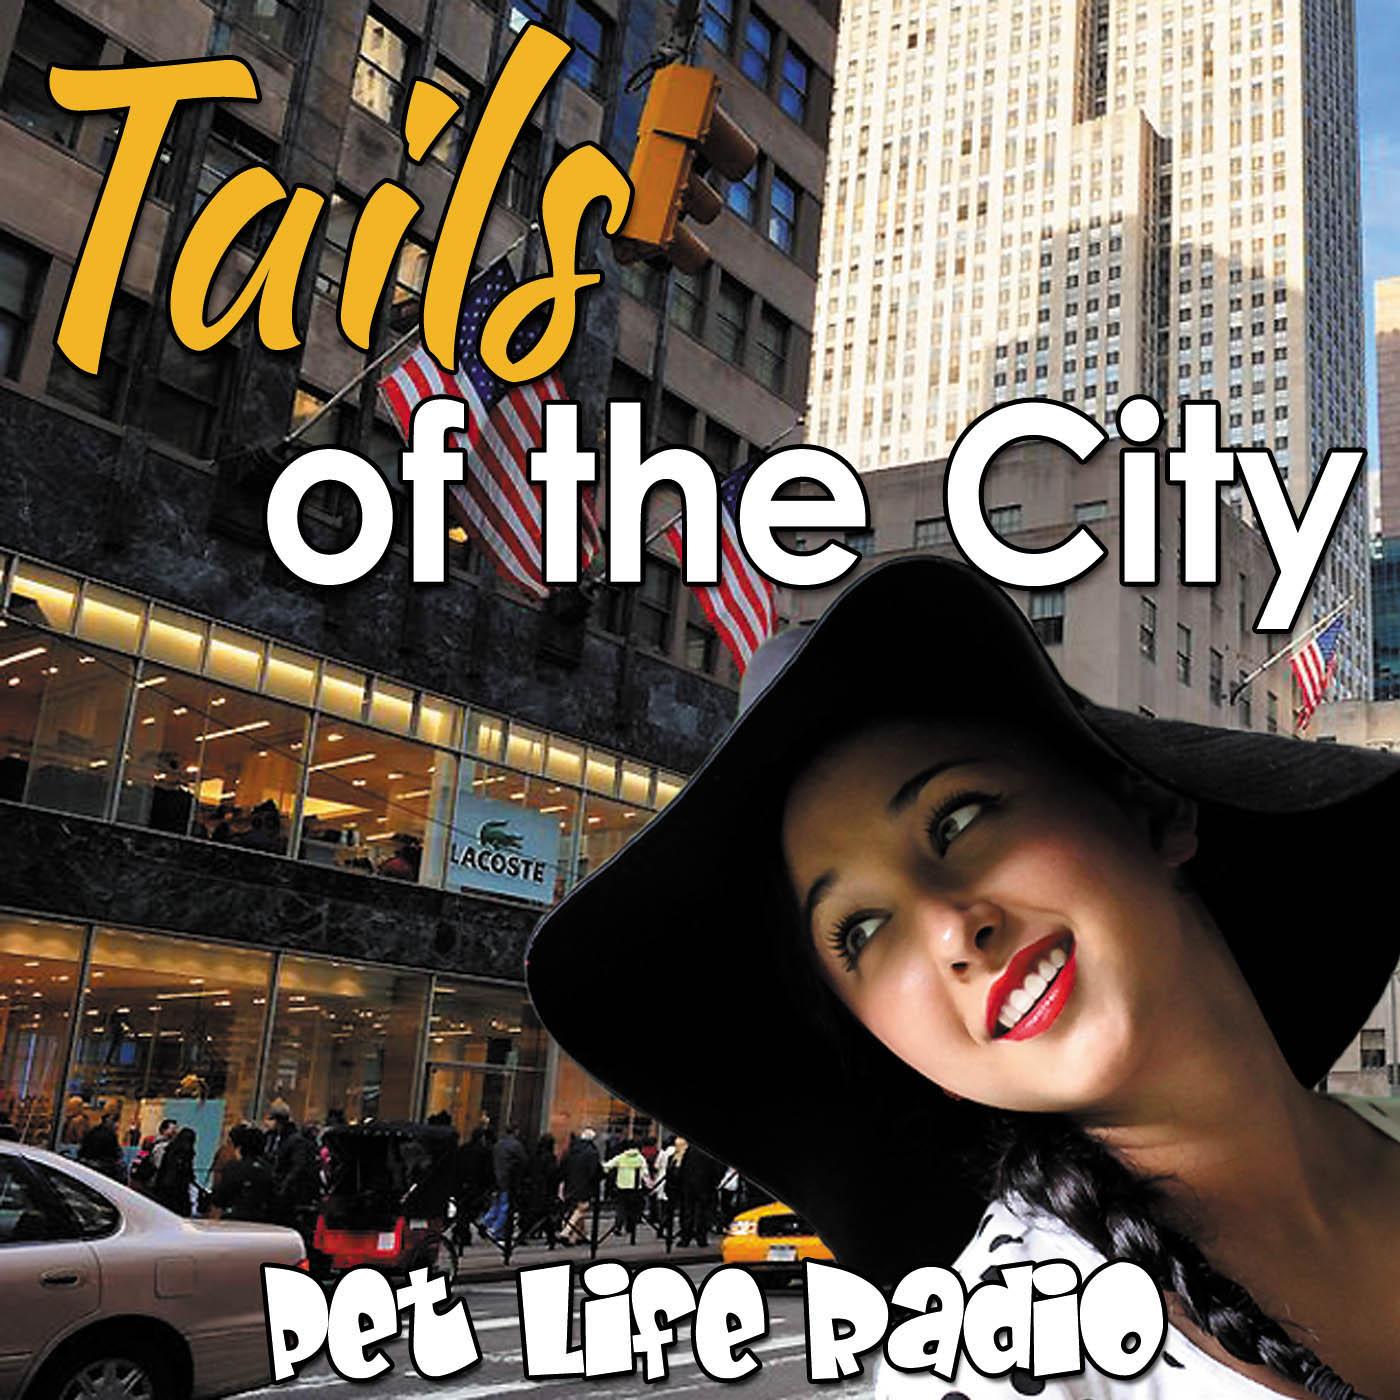 Tails of the City on Pet Life Radio (PetLifeRadio.com)